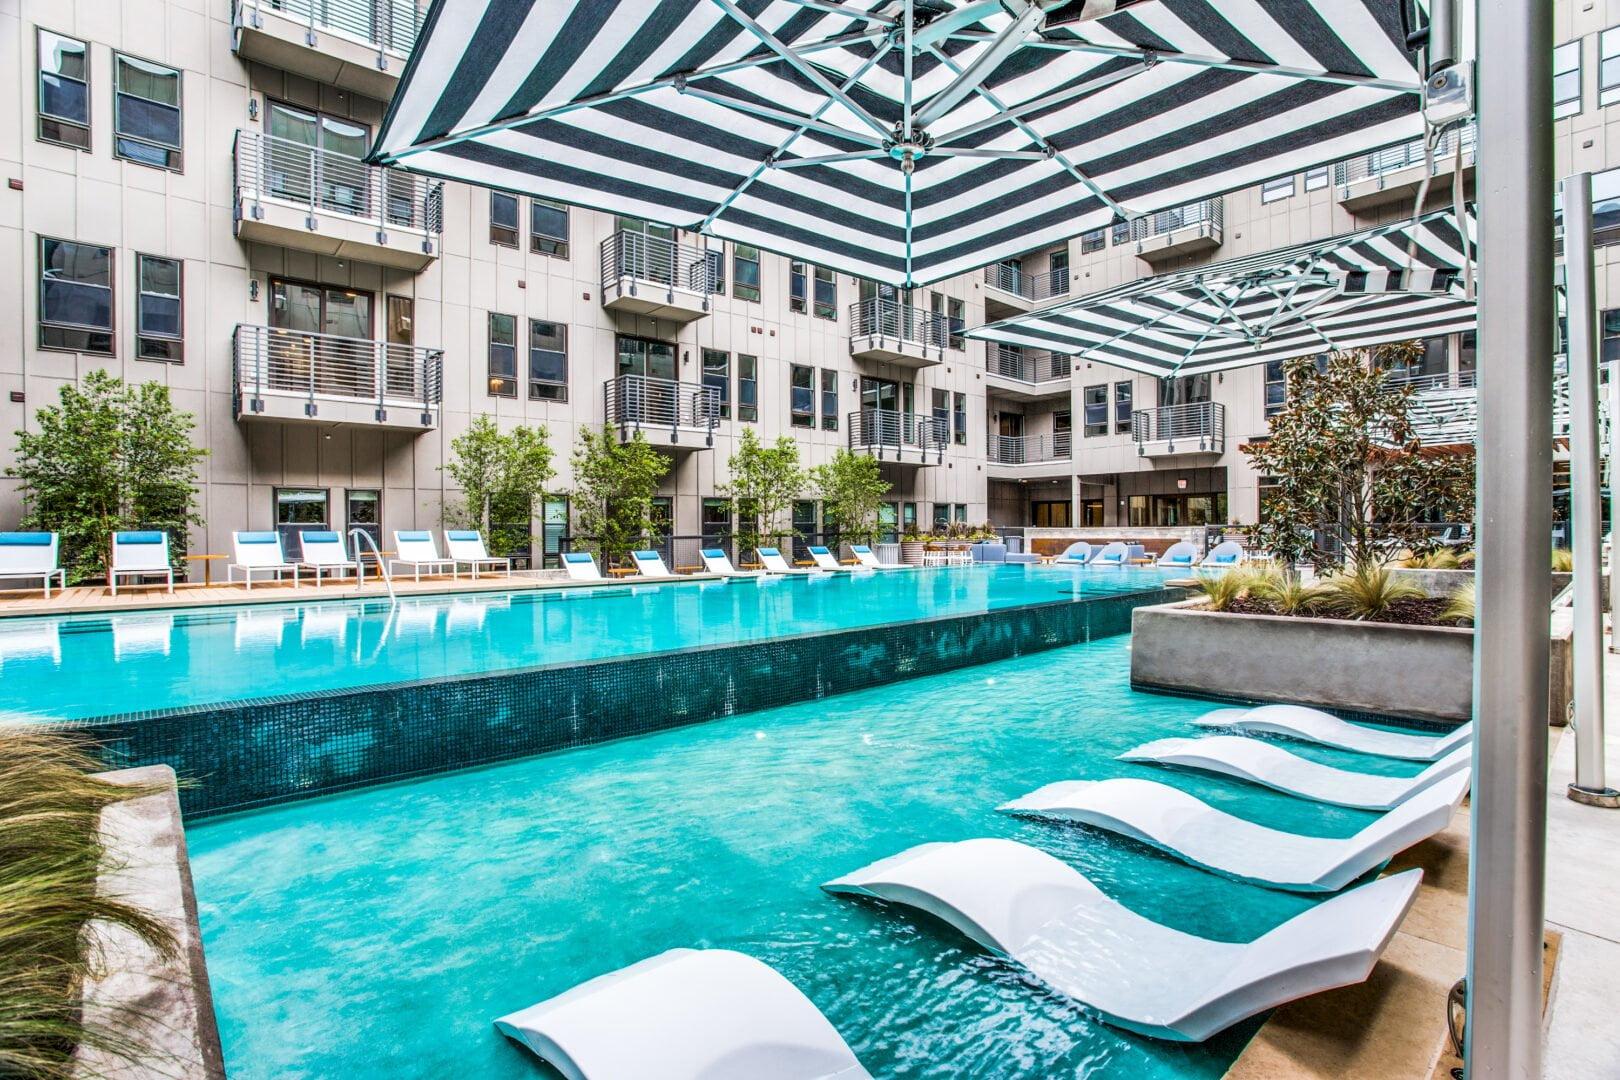 Fort Worth Apartment Specials 2